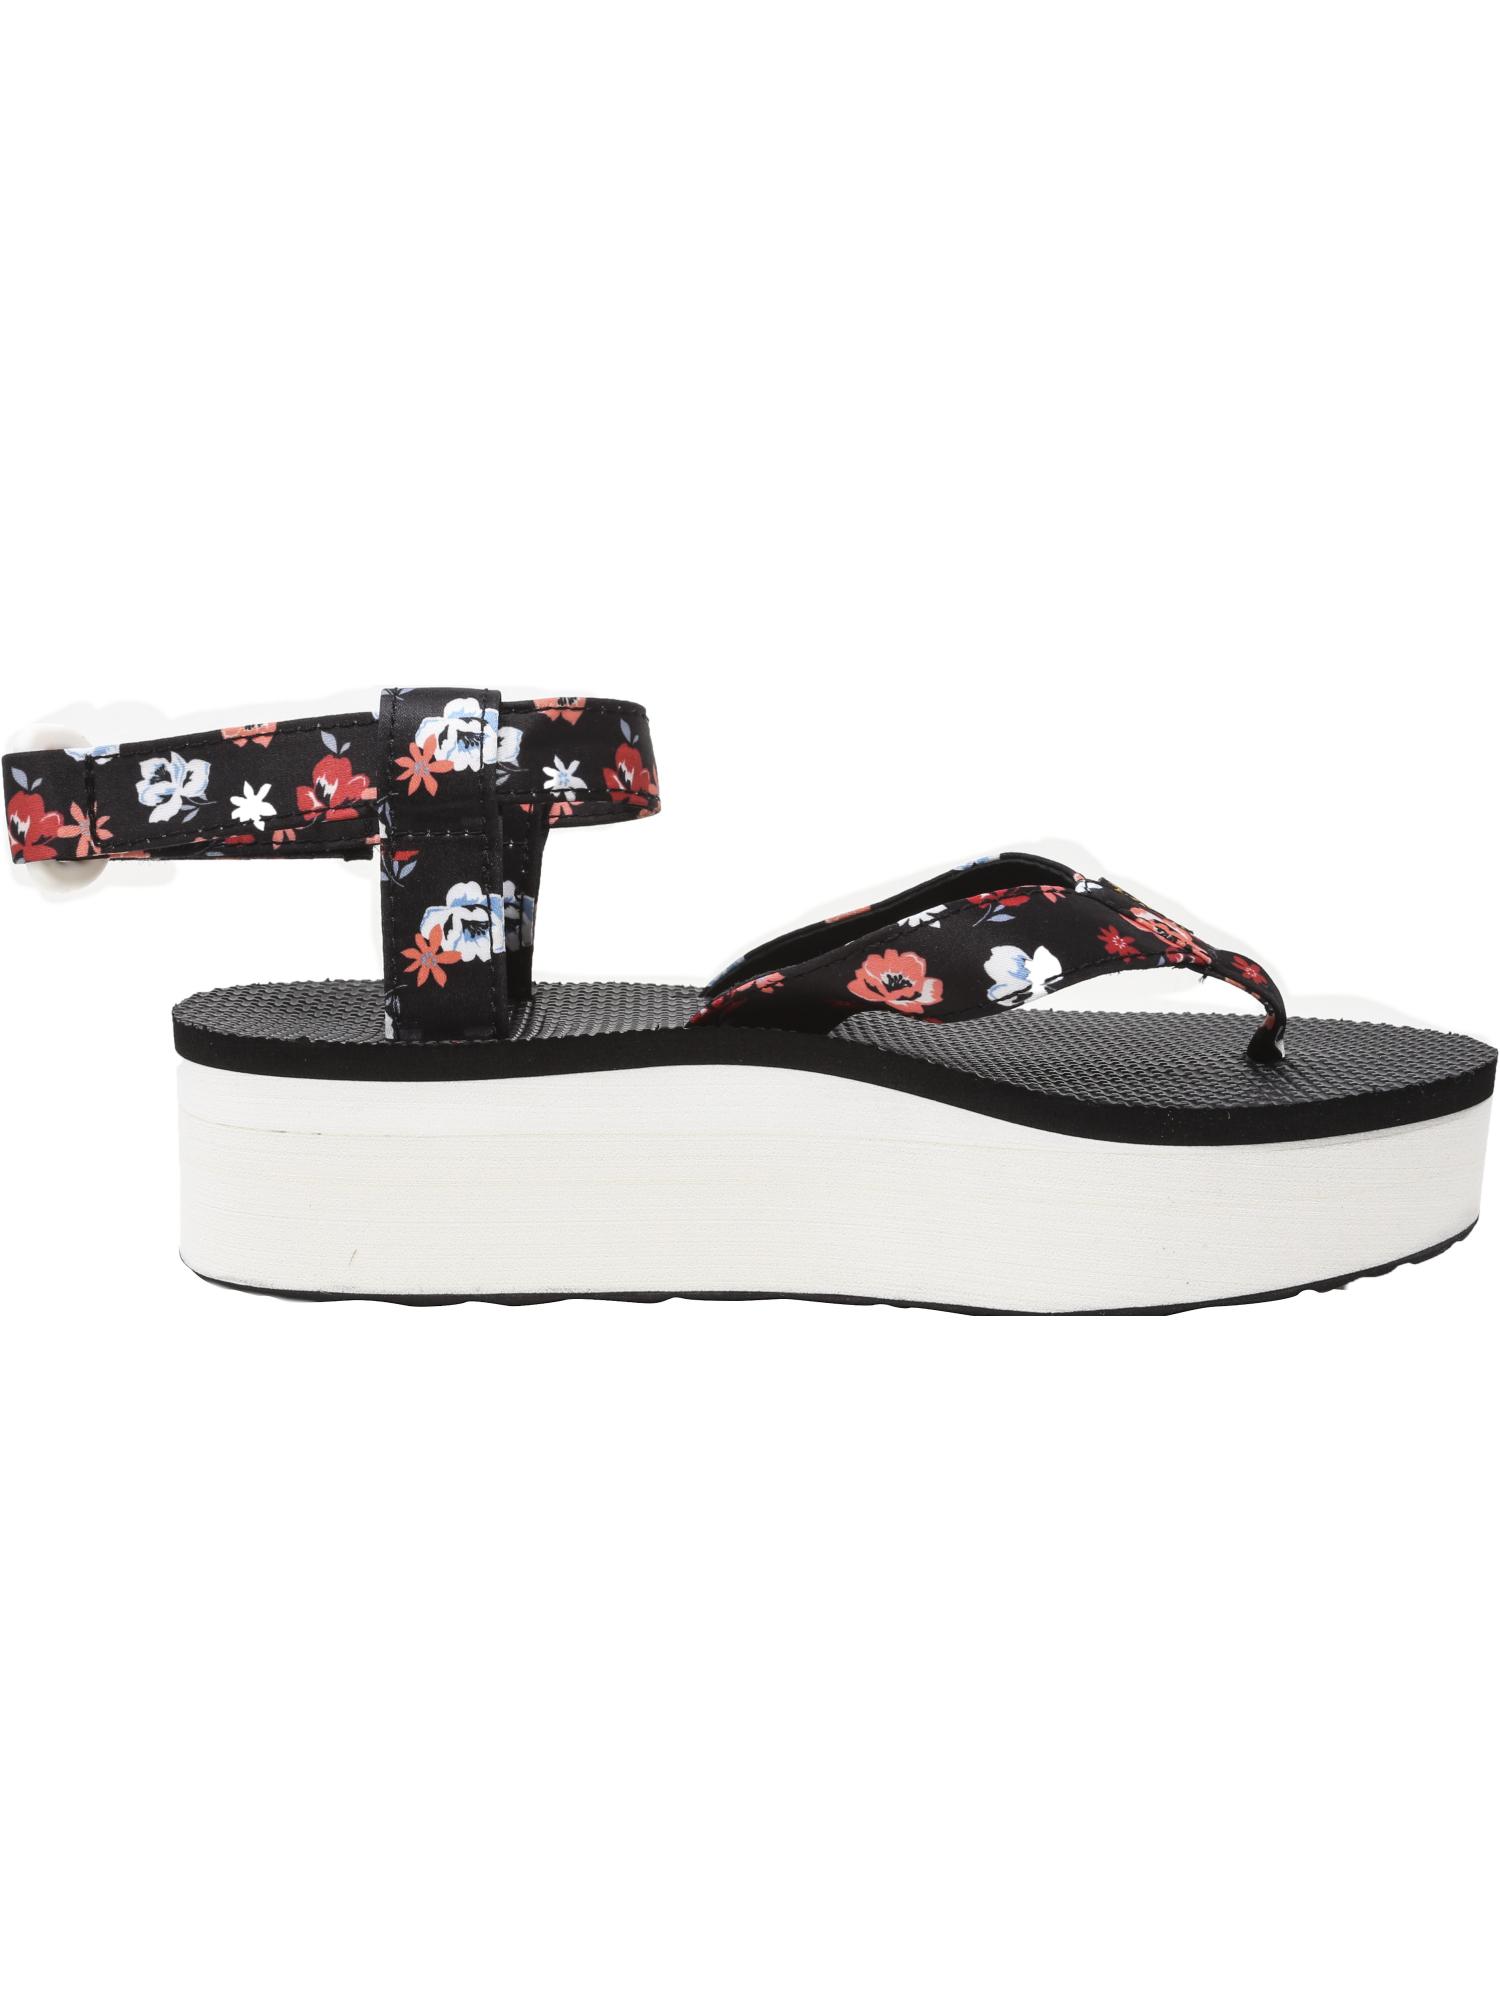 Teva-Women-039-s-Flatform-Sandal-Floral-Ankle-High thumbnail 11